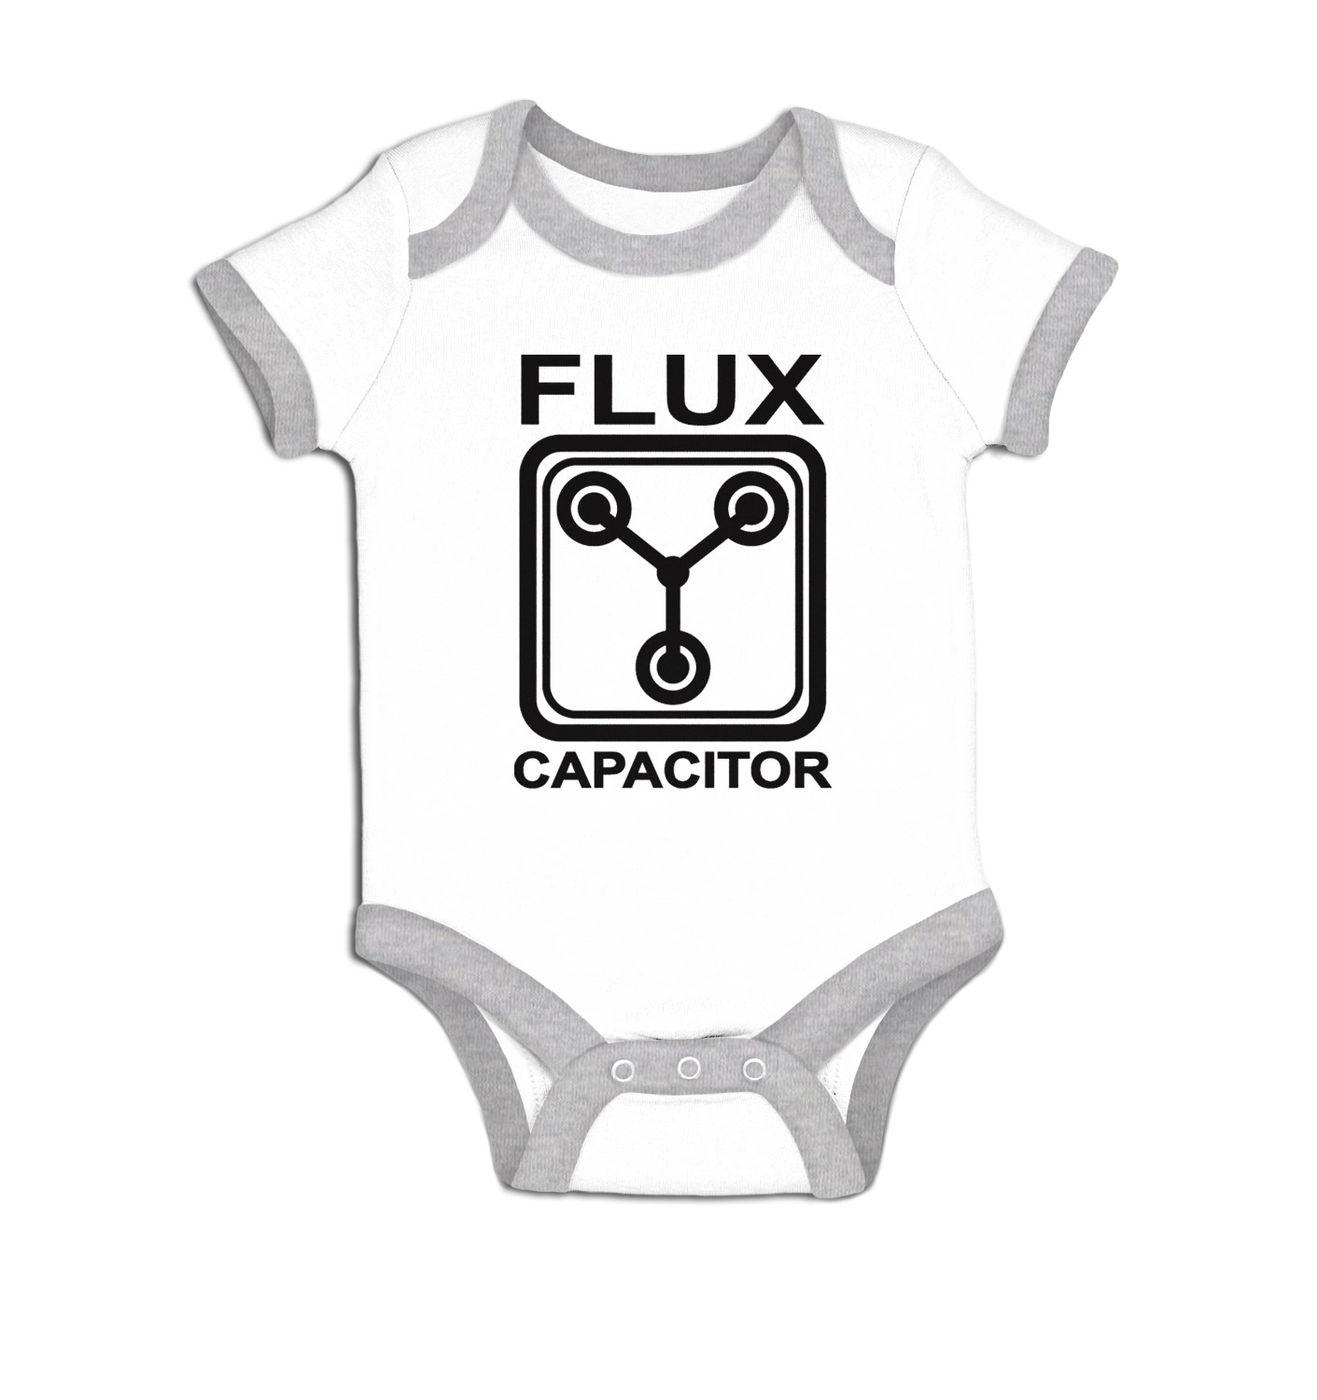 Flux Capacitor baby grow